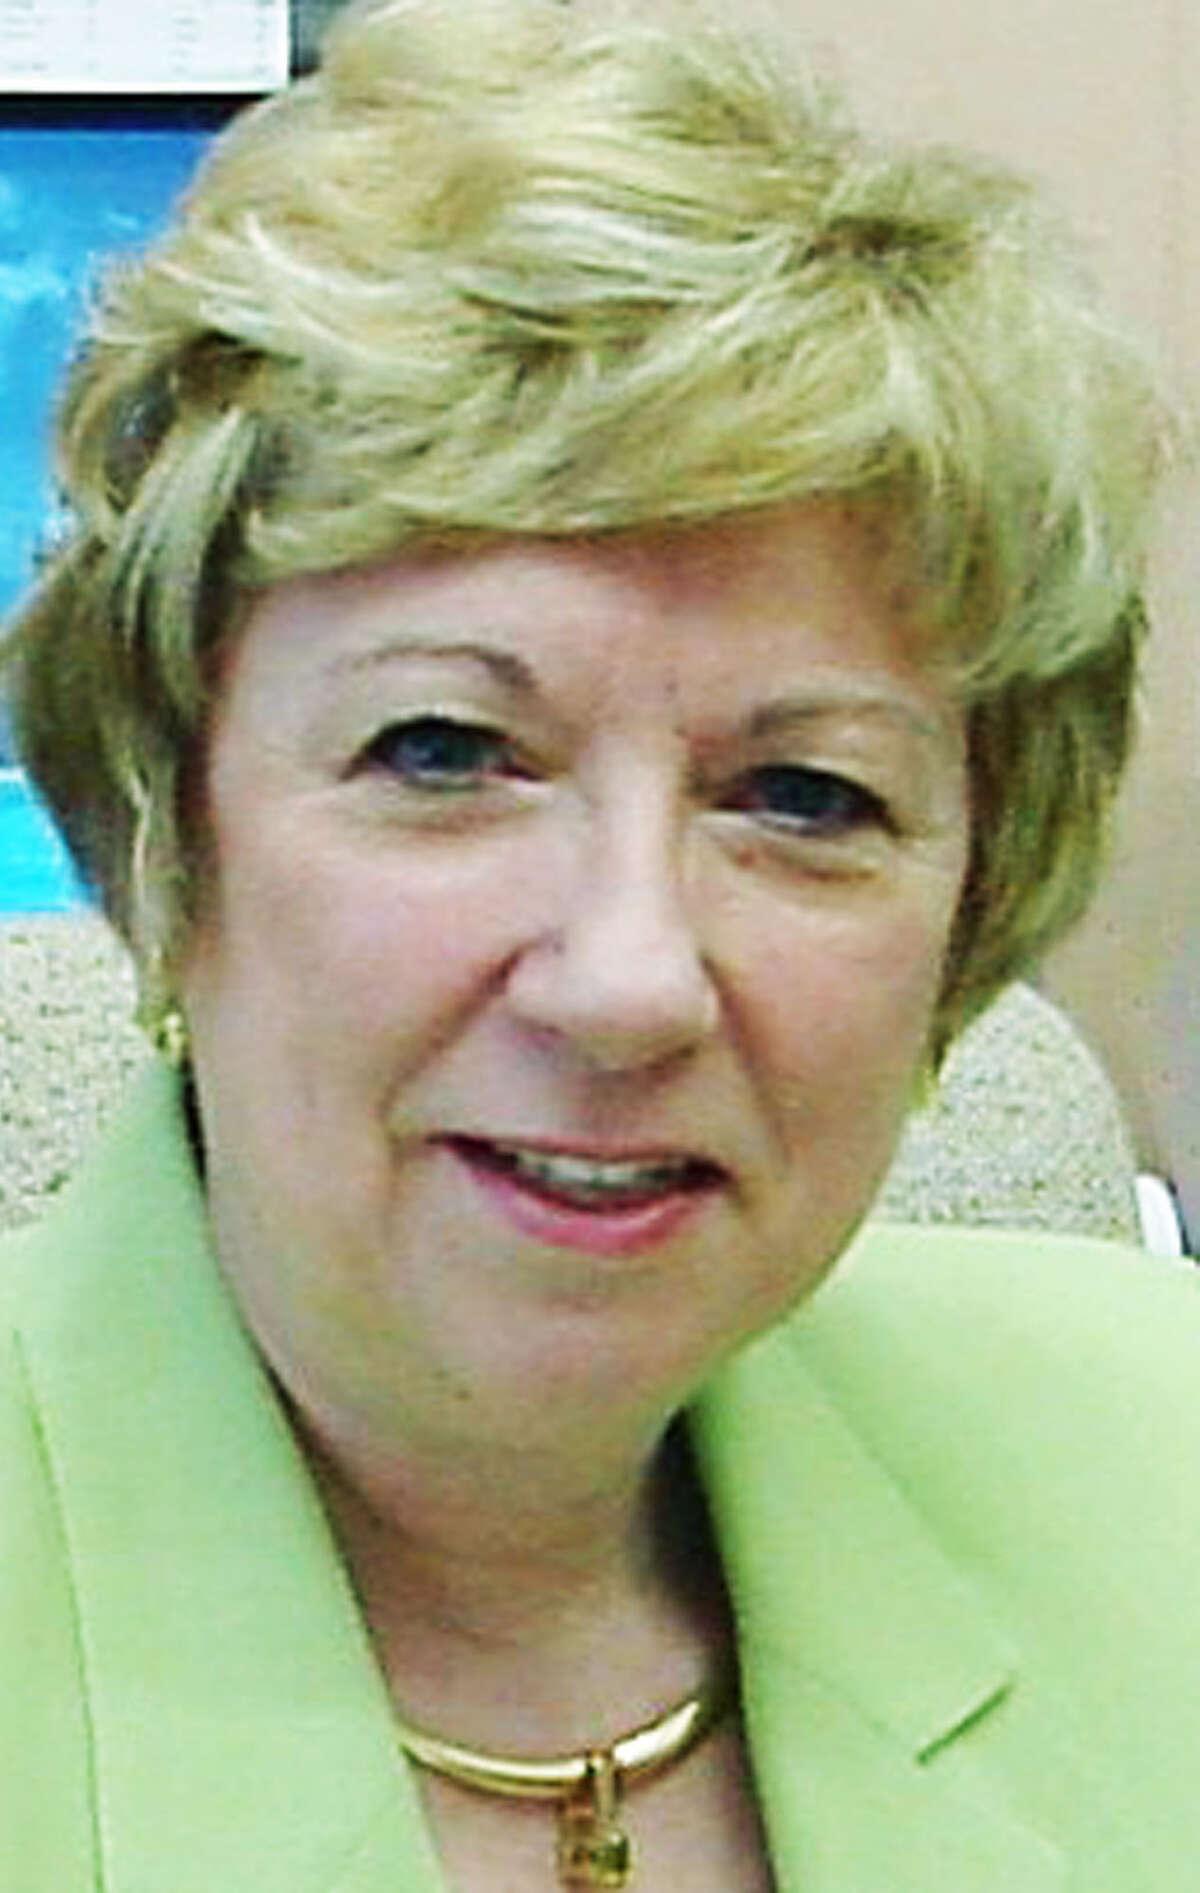 JeanAnn Paddyfote, New Milford Superintendent of Schools